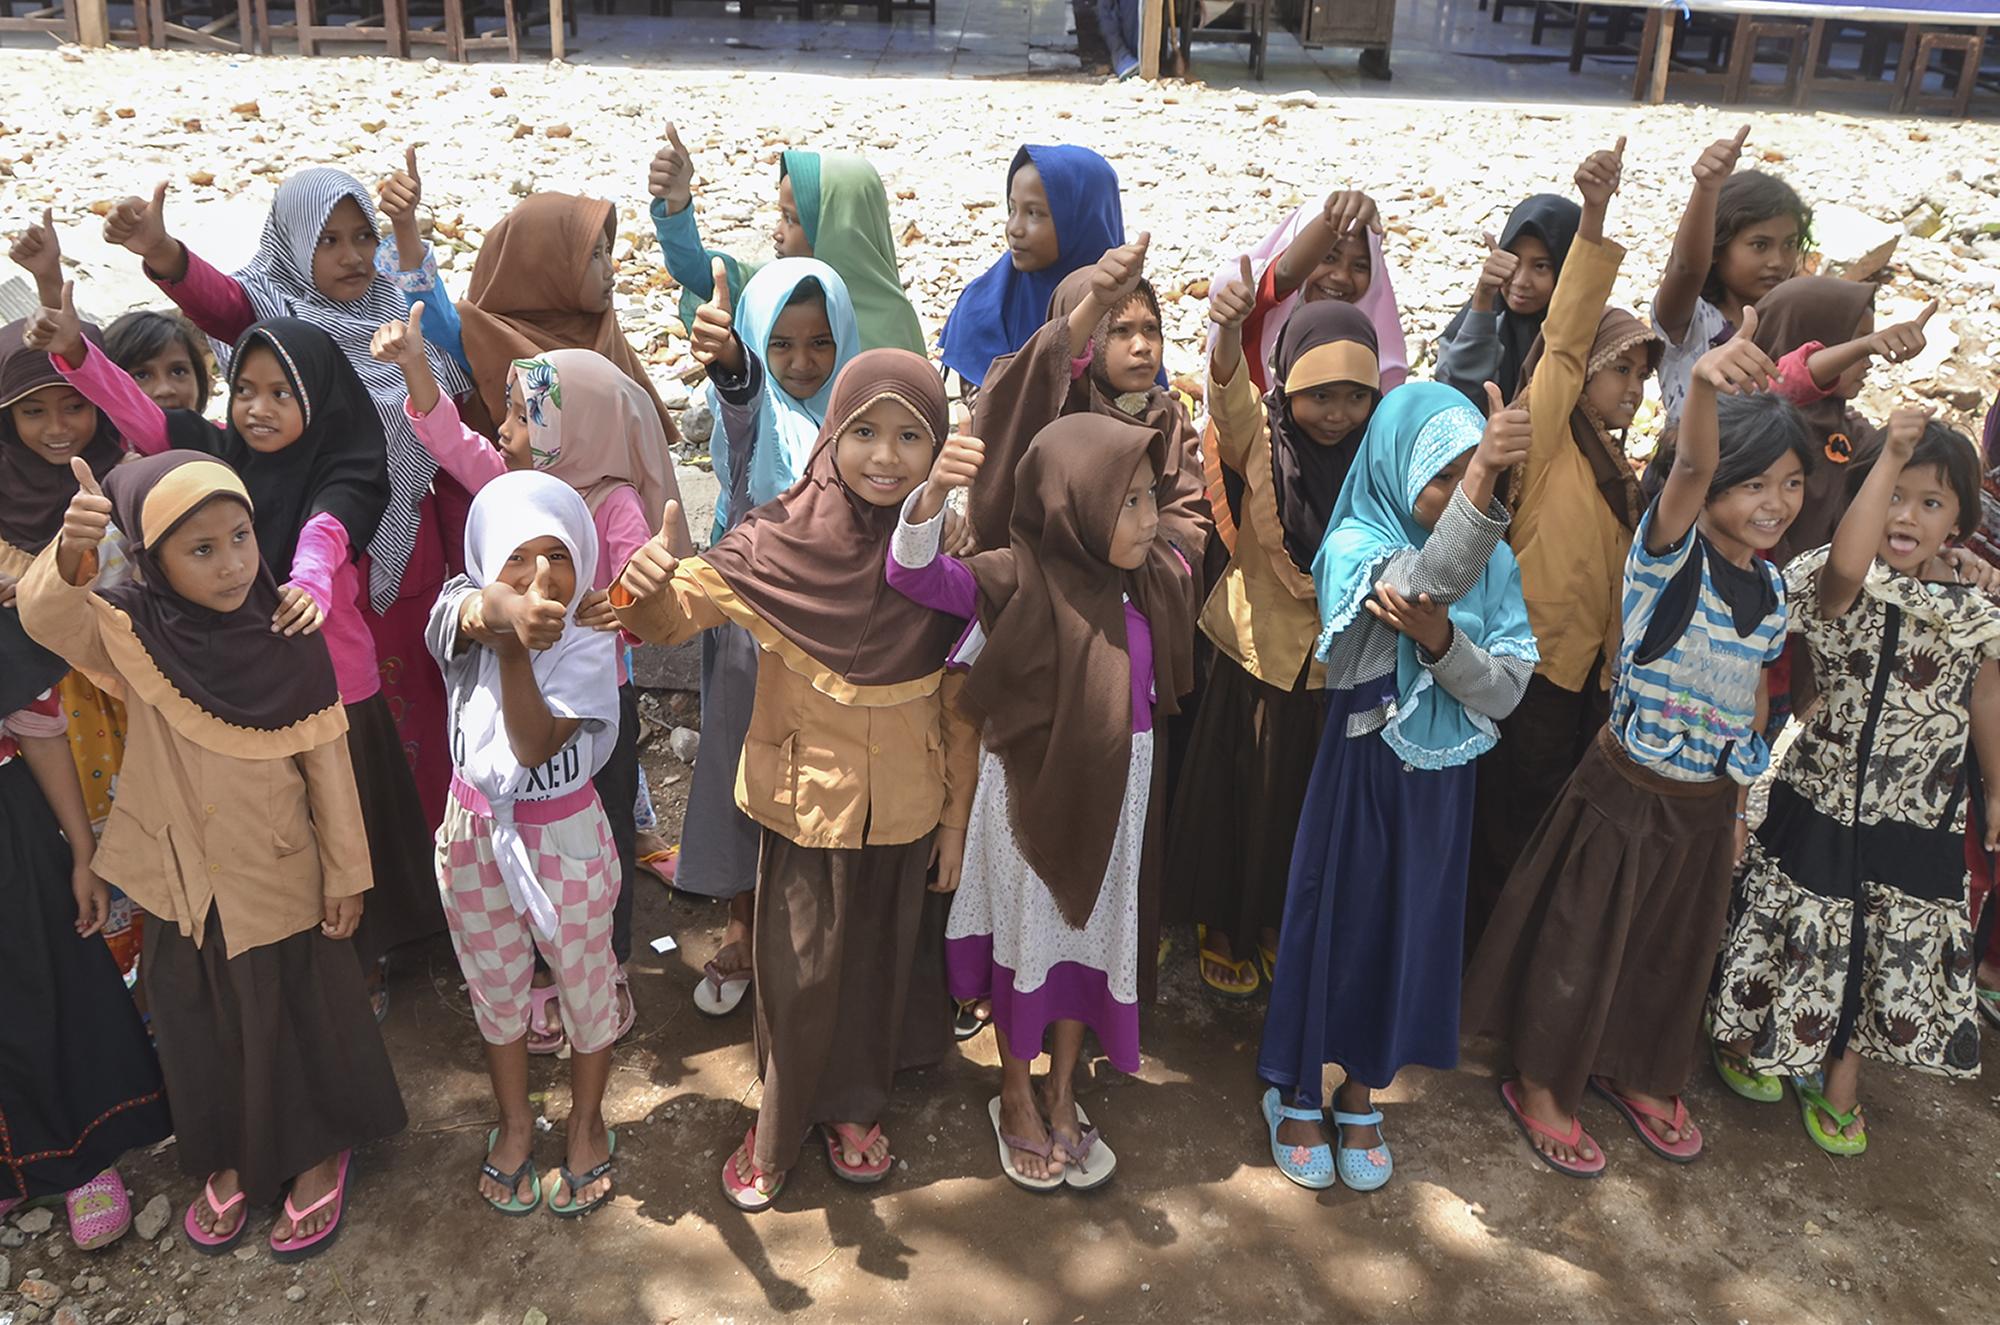 Investasi Reksadana Toppers Kembalikan Keceriaan Anak Pasca Gempa Lombok